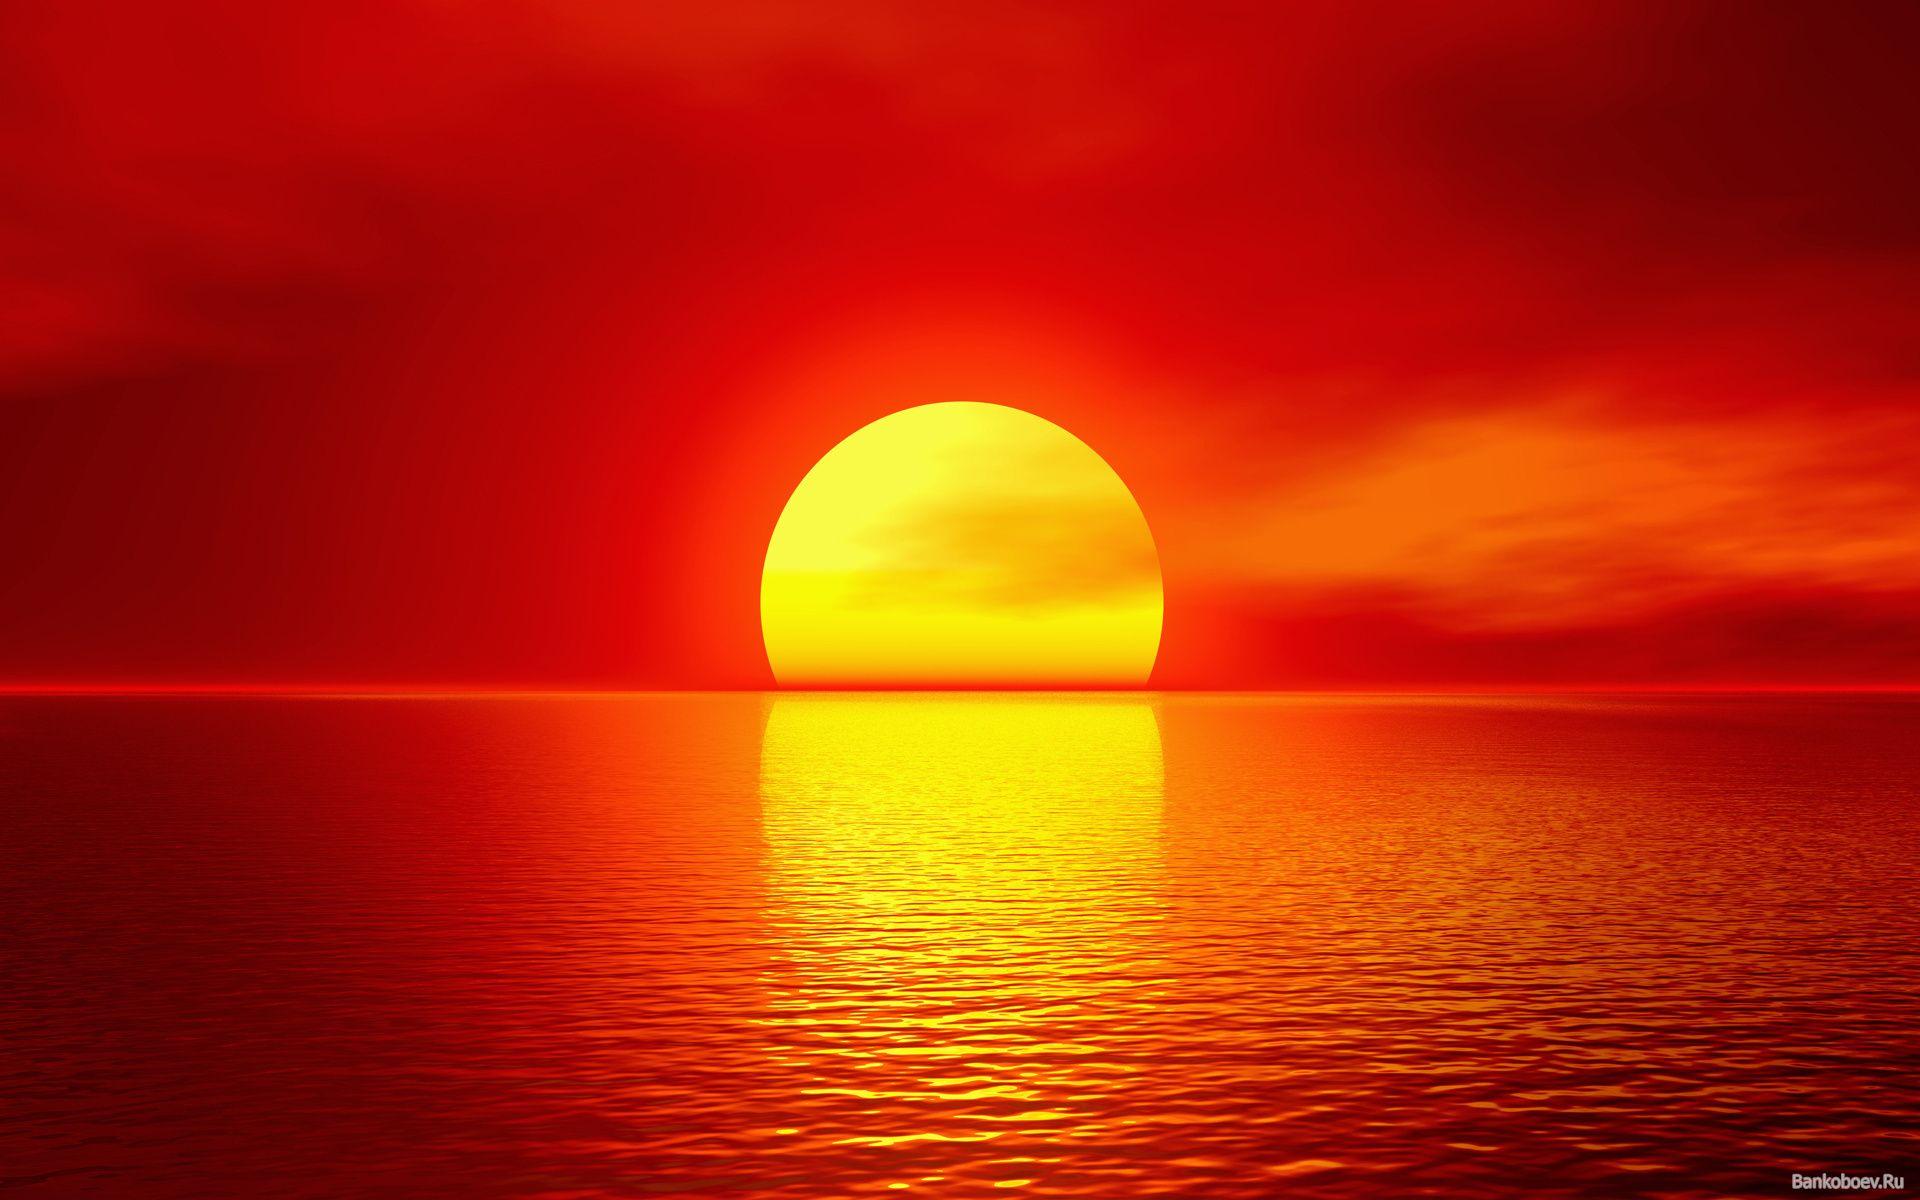 закат солнца - Поиск в Google | Картинки с закатом, Закаты ...